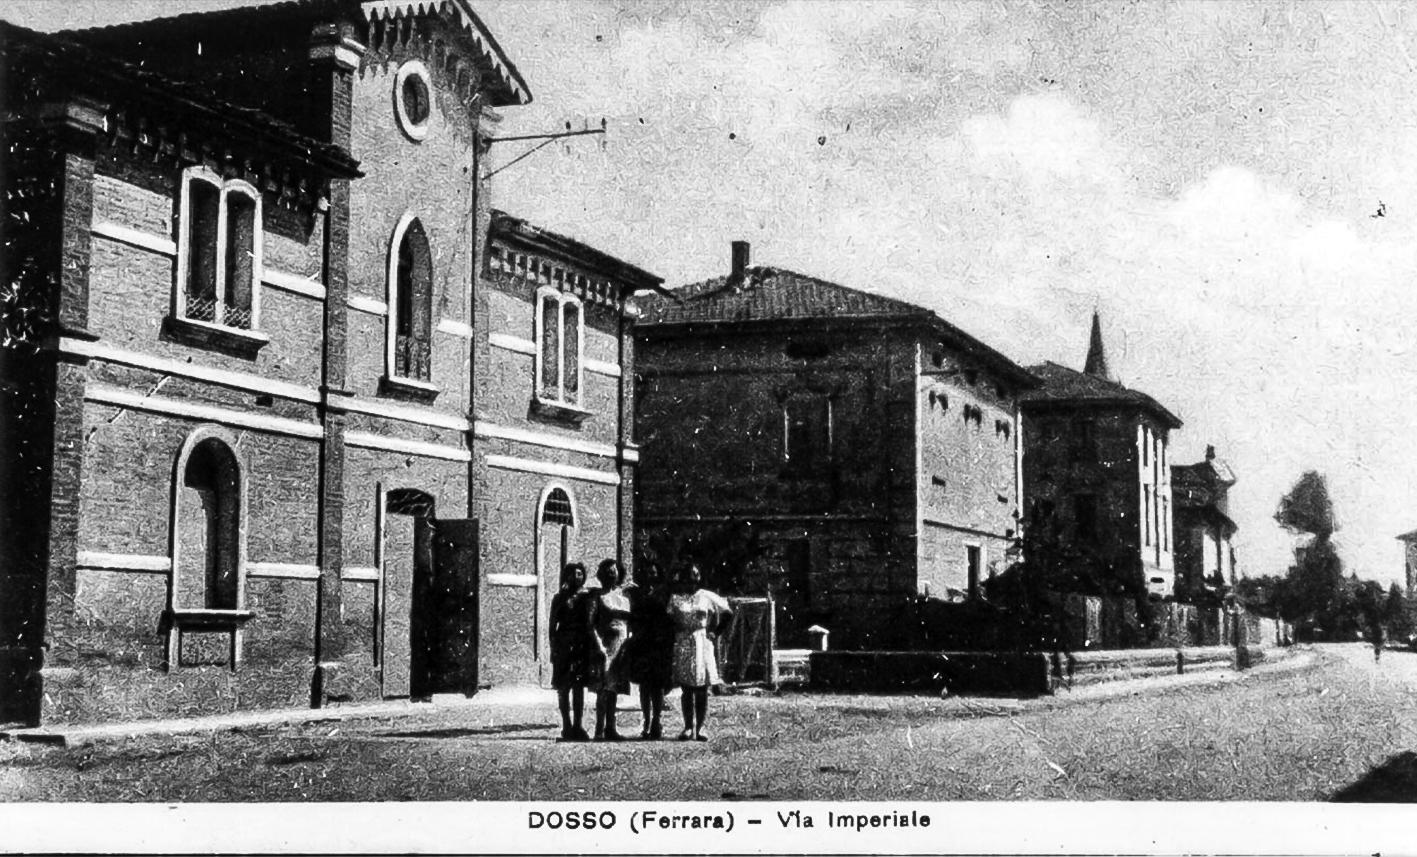 Dosso Via Imperiale 1940